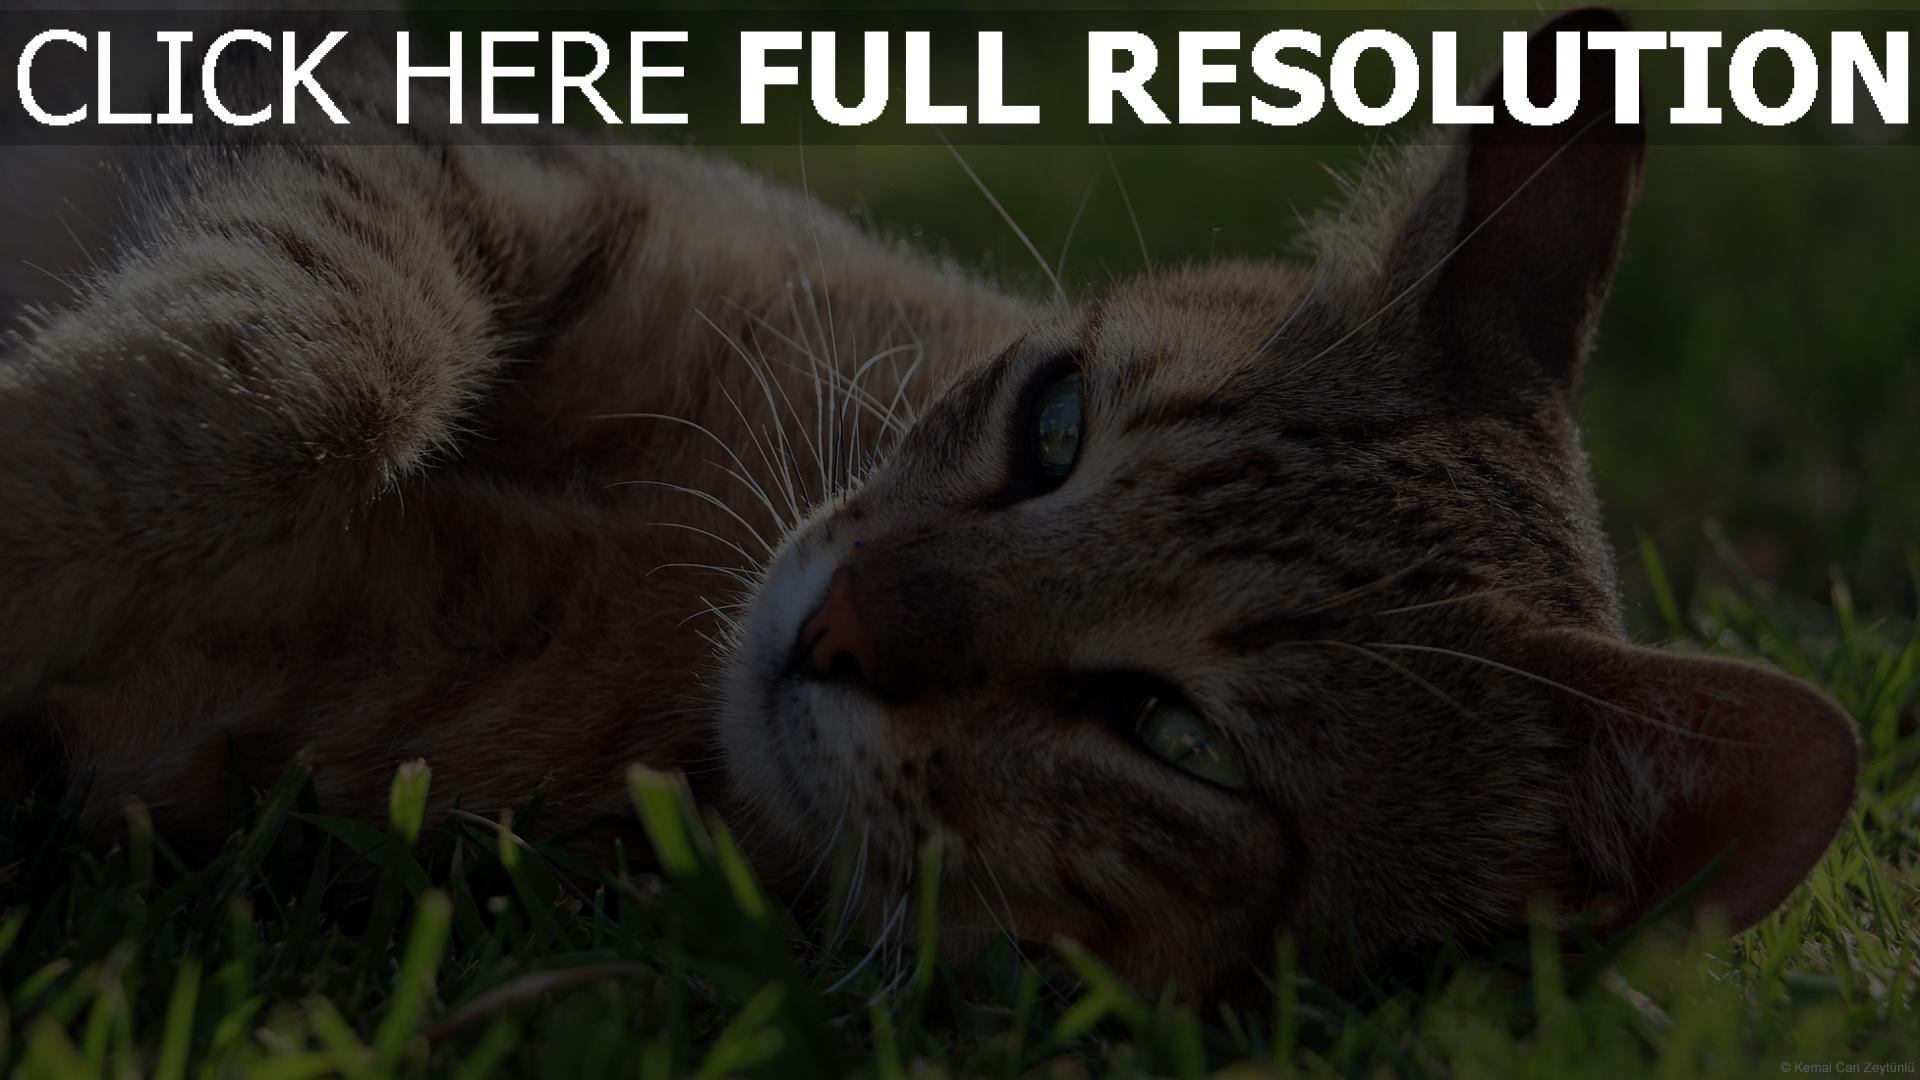 hd hintergrundbilder gras maulkorb lügen katze ruhe 1920x1080